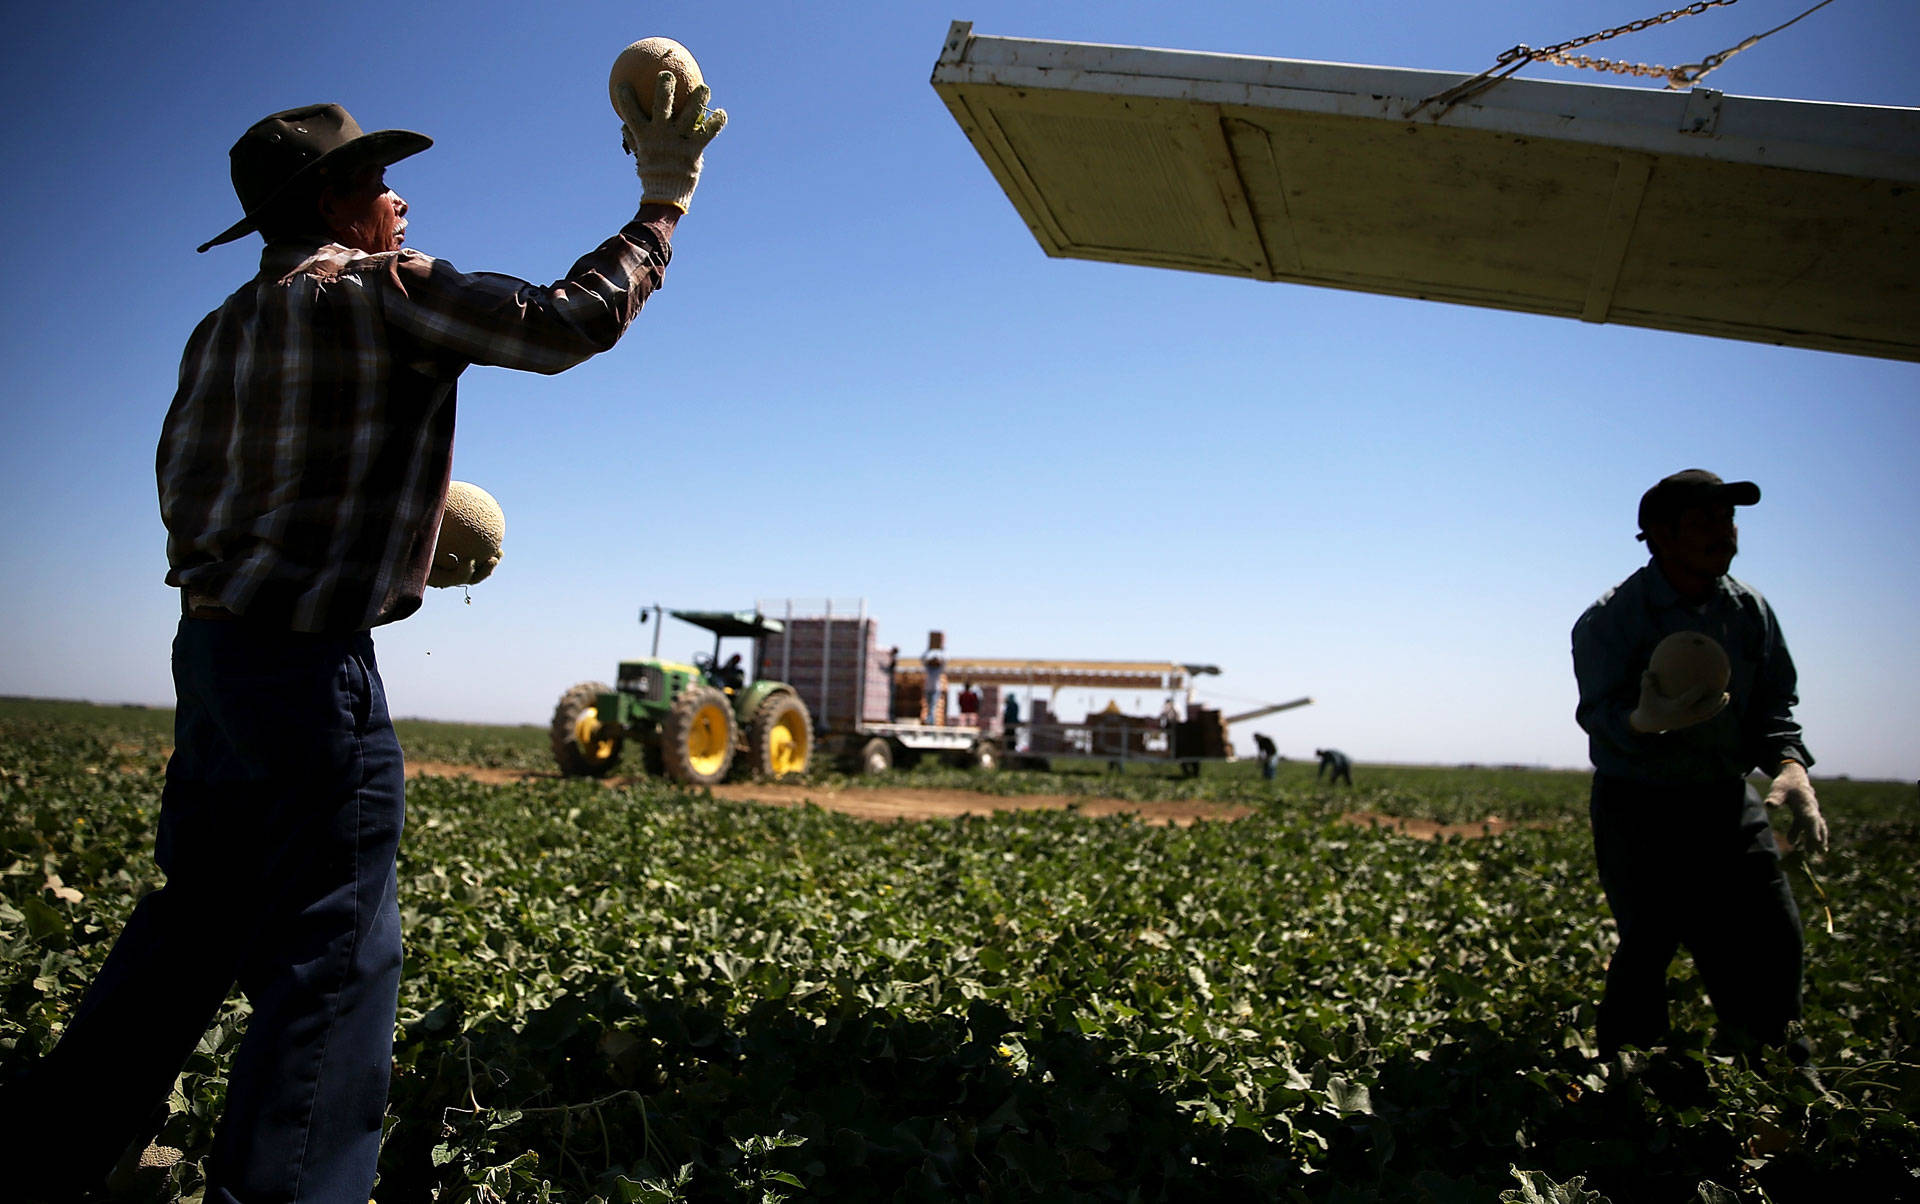 A farmworker harvests cantaloupes on a farm near Firebaugh. Justin Sullivan/Getty Images